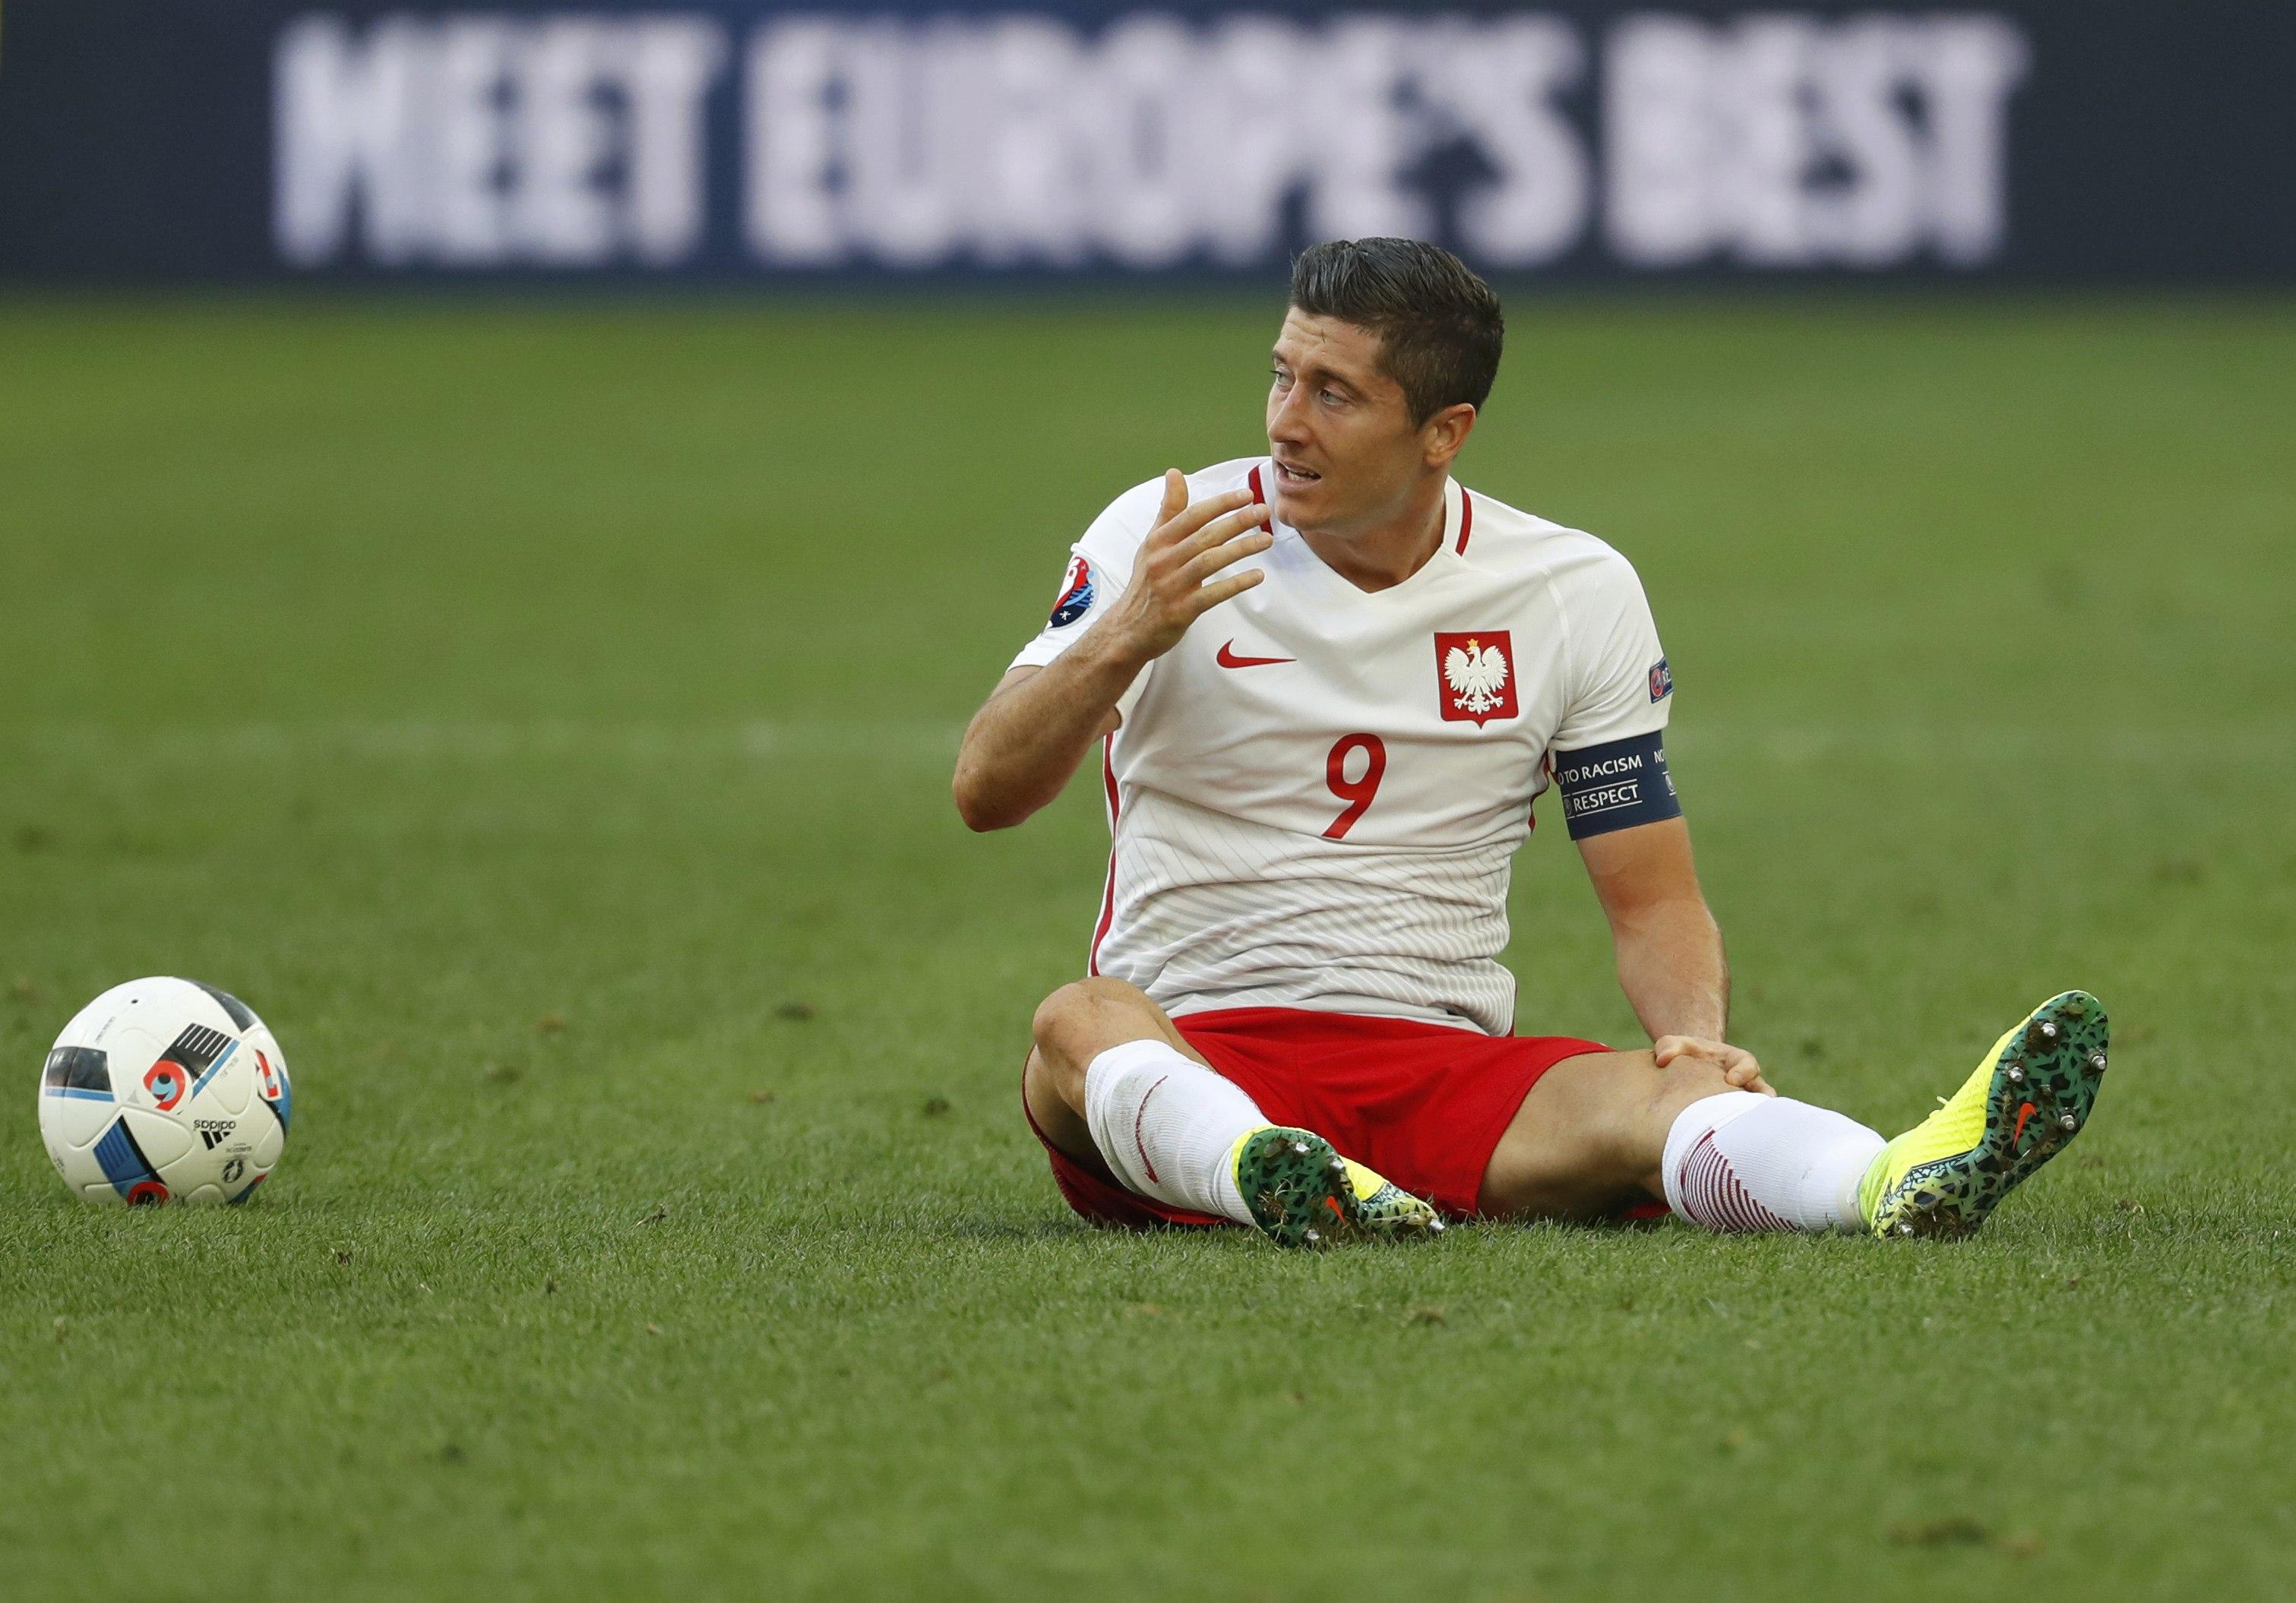 Euro 2016: Goal-shy Lewandowski still Poland's engine, says coach